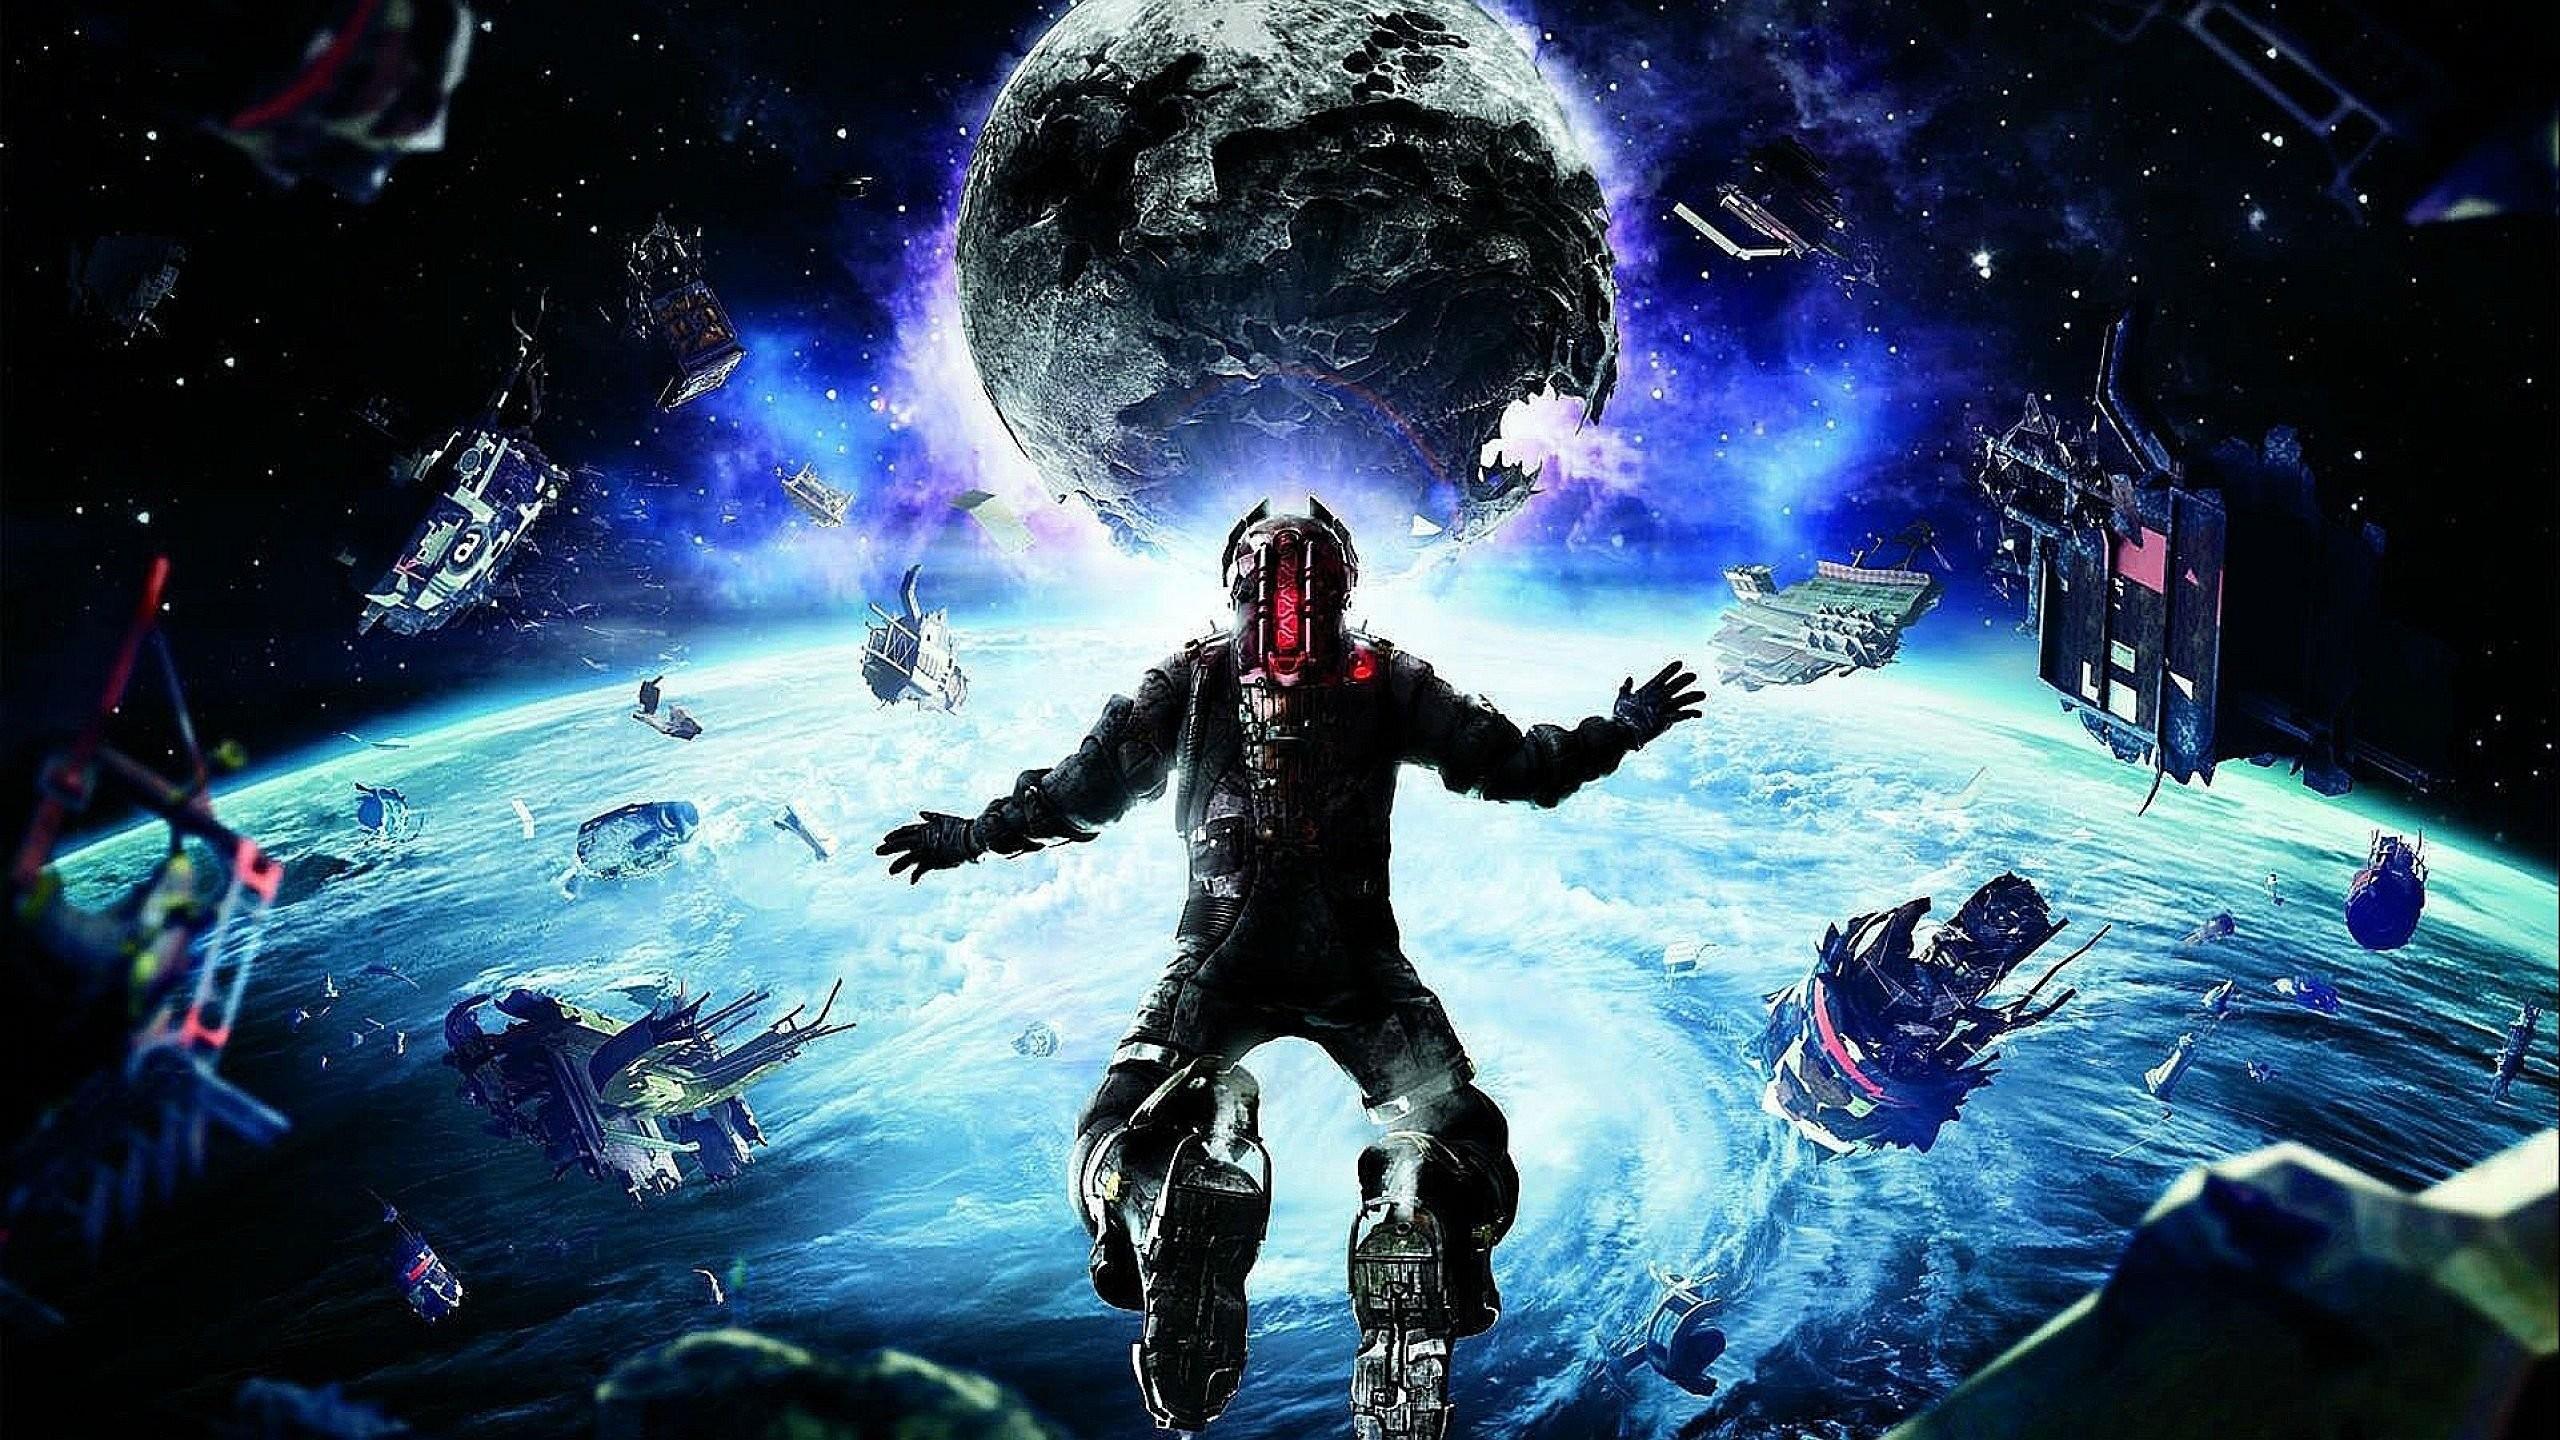 DEAD SPACE sci-fi shooter action futuristic 1deads warrior cyborg robot alien  aliens artwork deadspace fighting wallpaper     740531    WallpaperUP